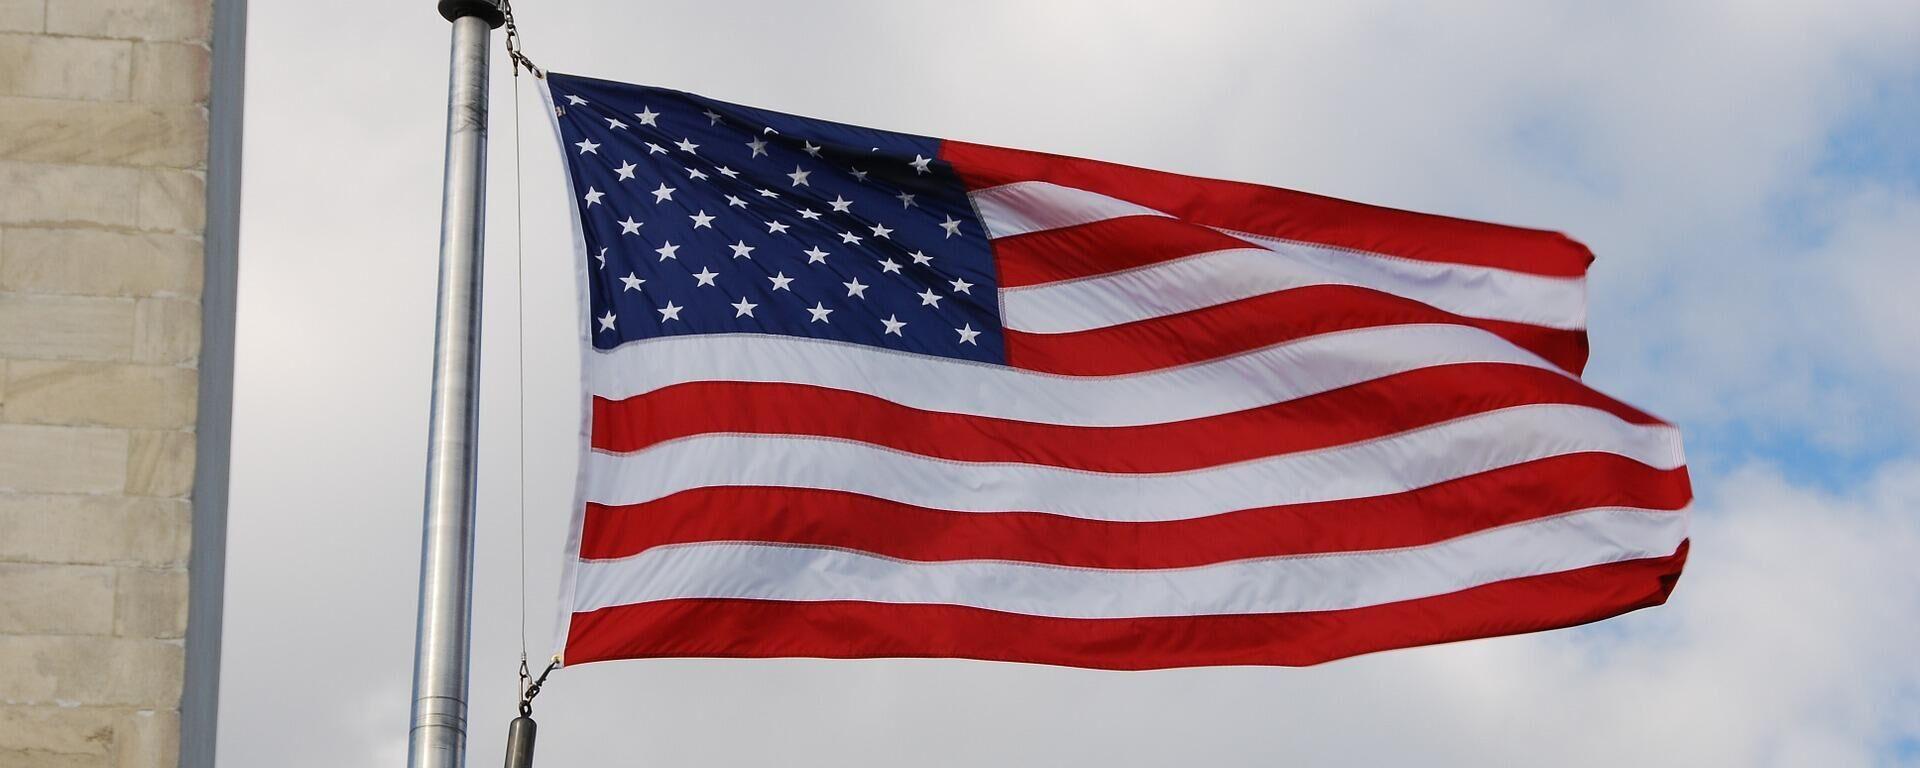 US Flagge (Symbolbild) - SNA, 1920, 03.07.2021